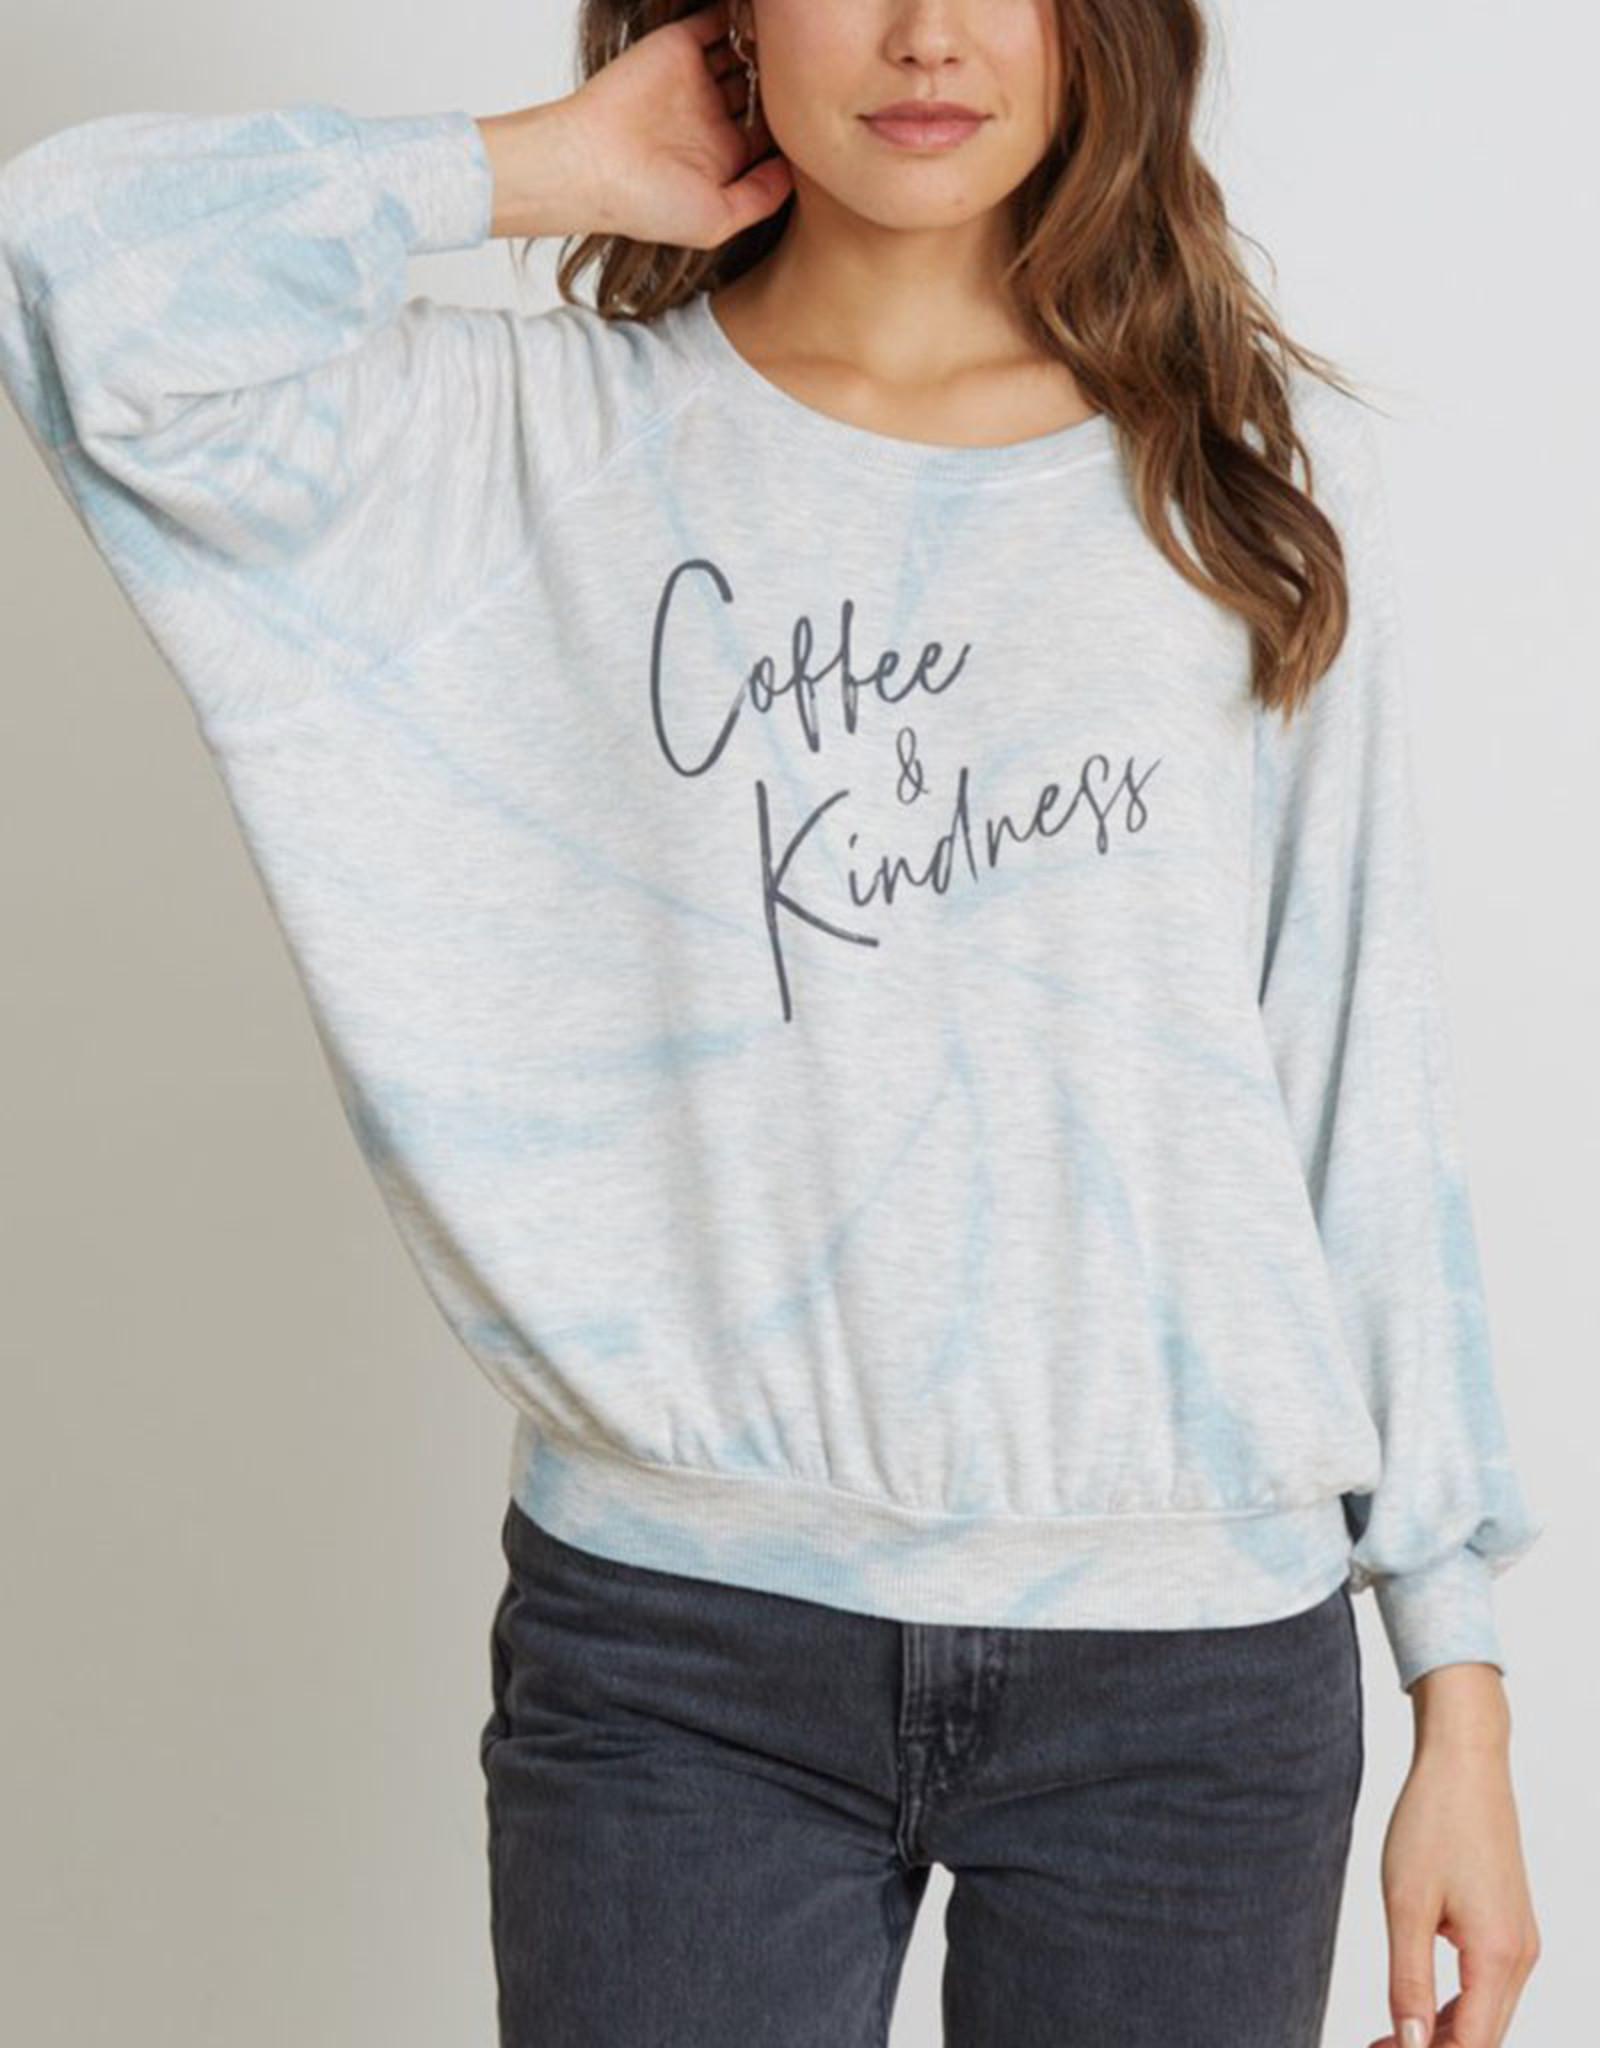 GOOD HYOUMAN COFFEE & KINDNESS - THE EMERSON